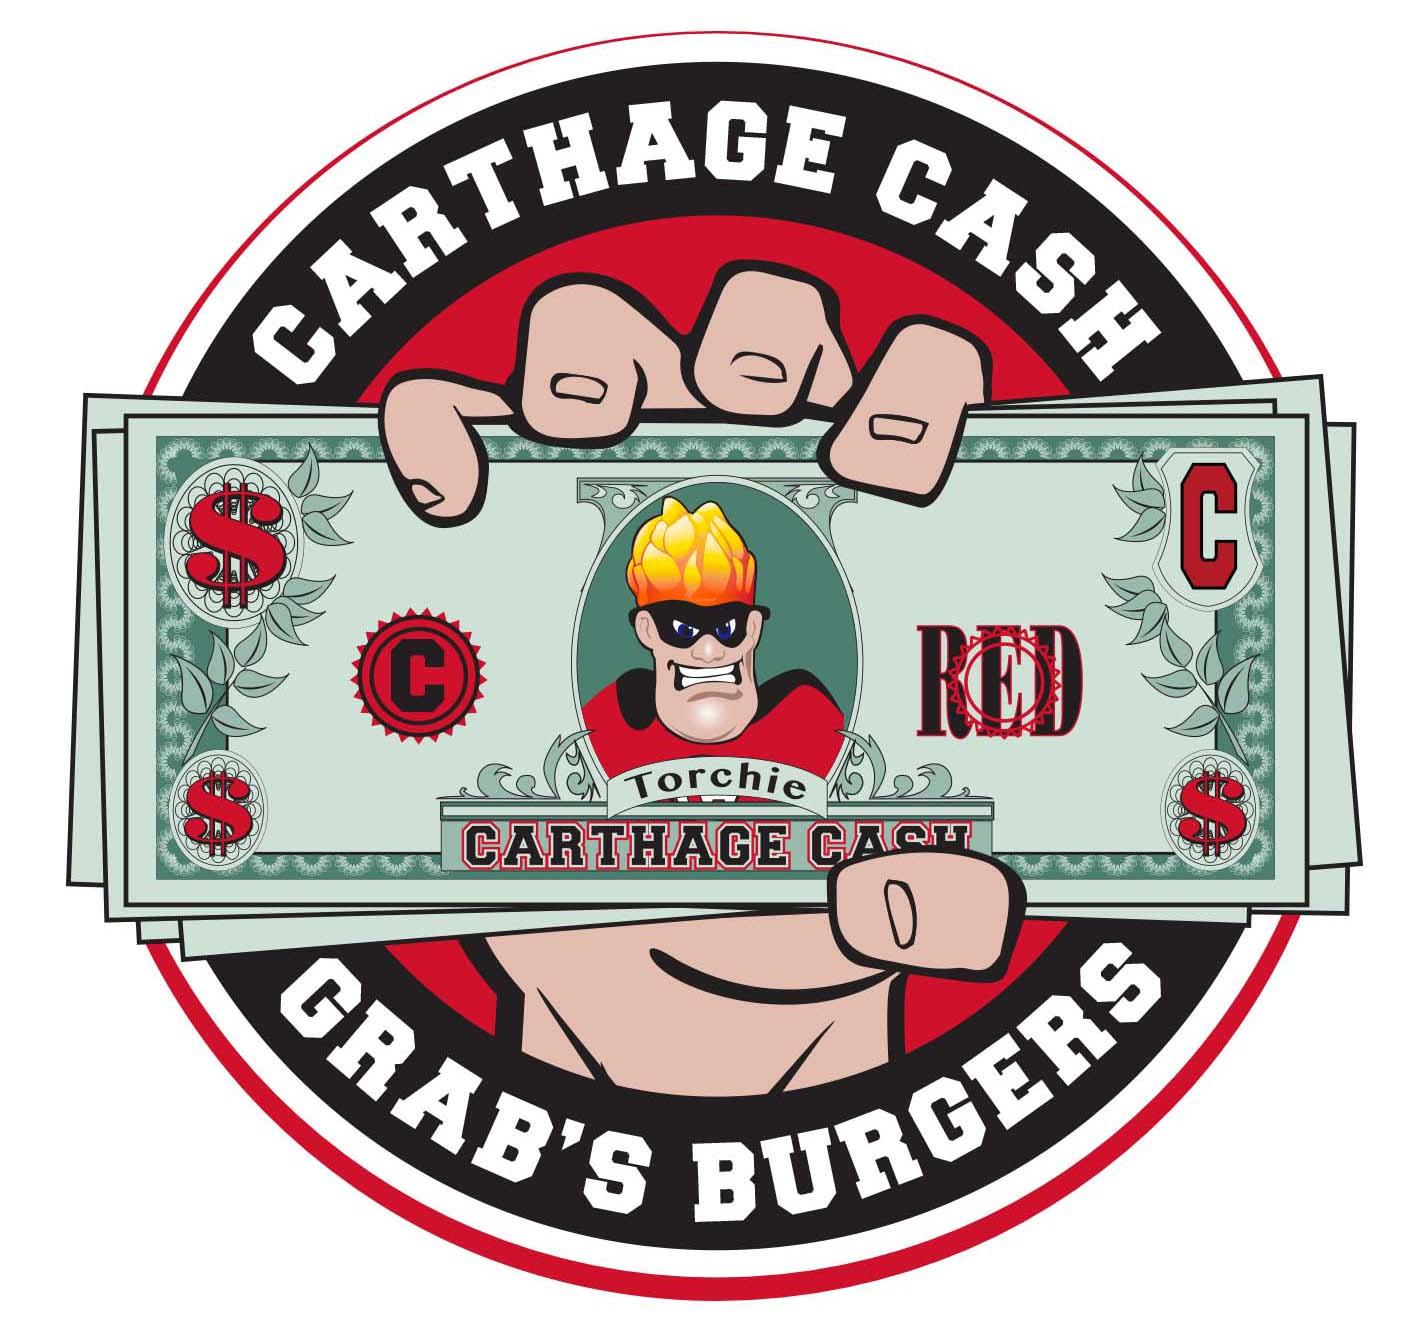 CarthageCash